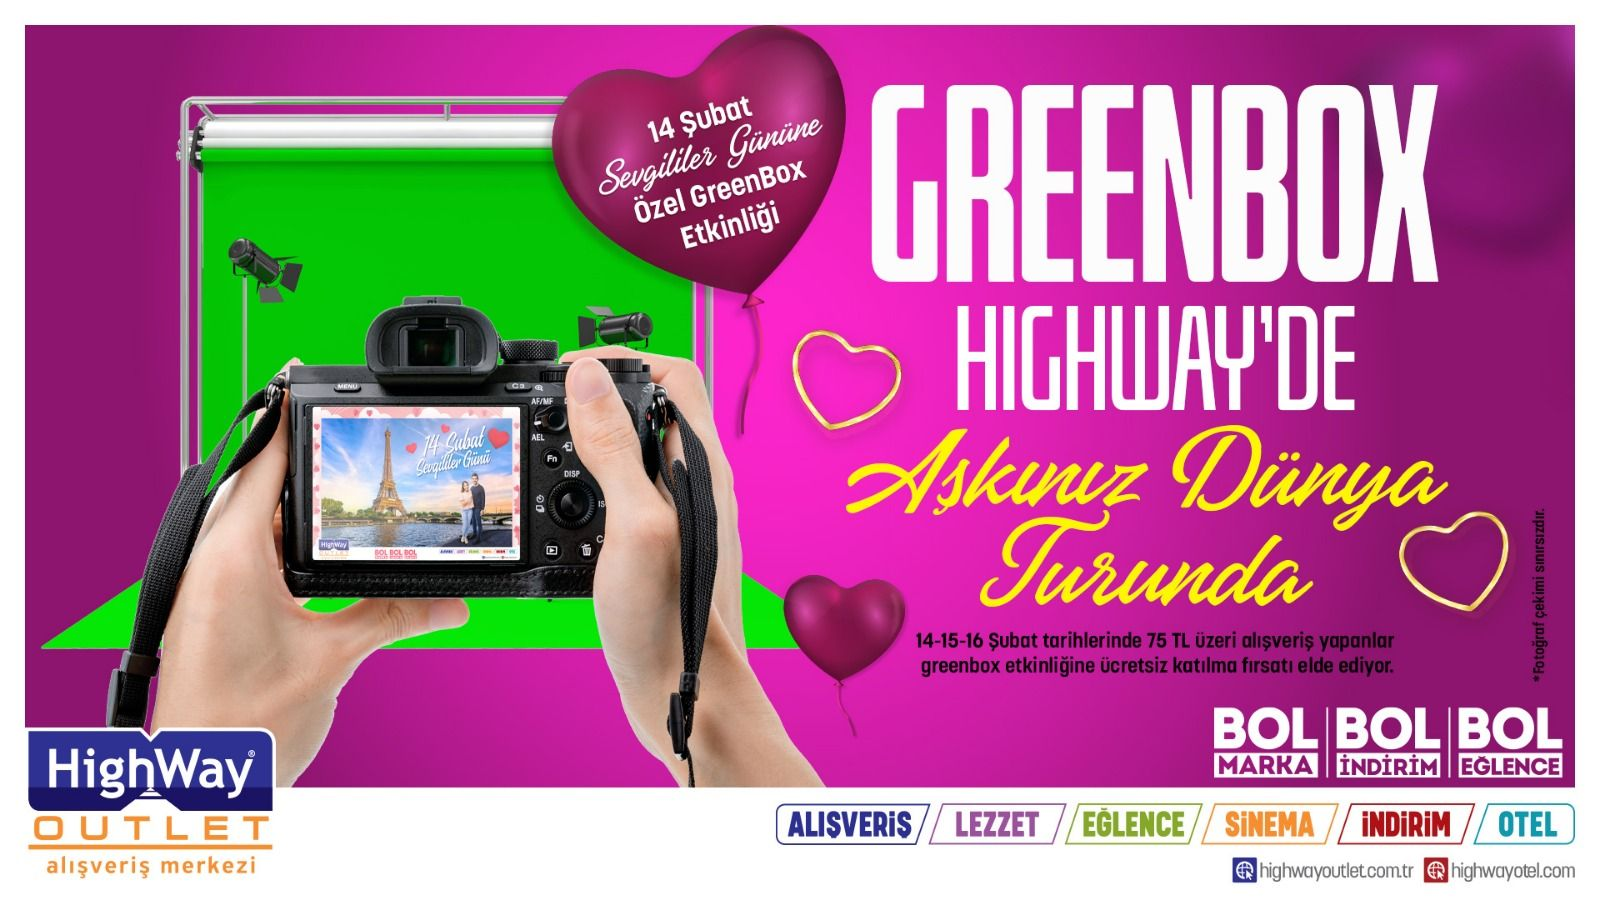 Greenbox Hıghway'de Aşkınız Dünya Turunda